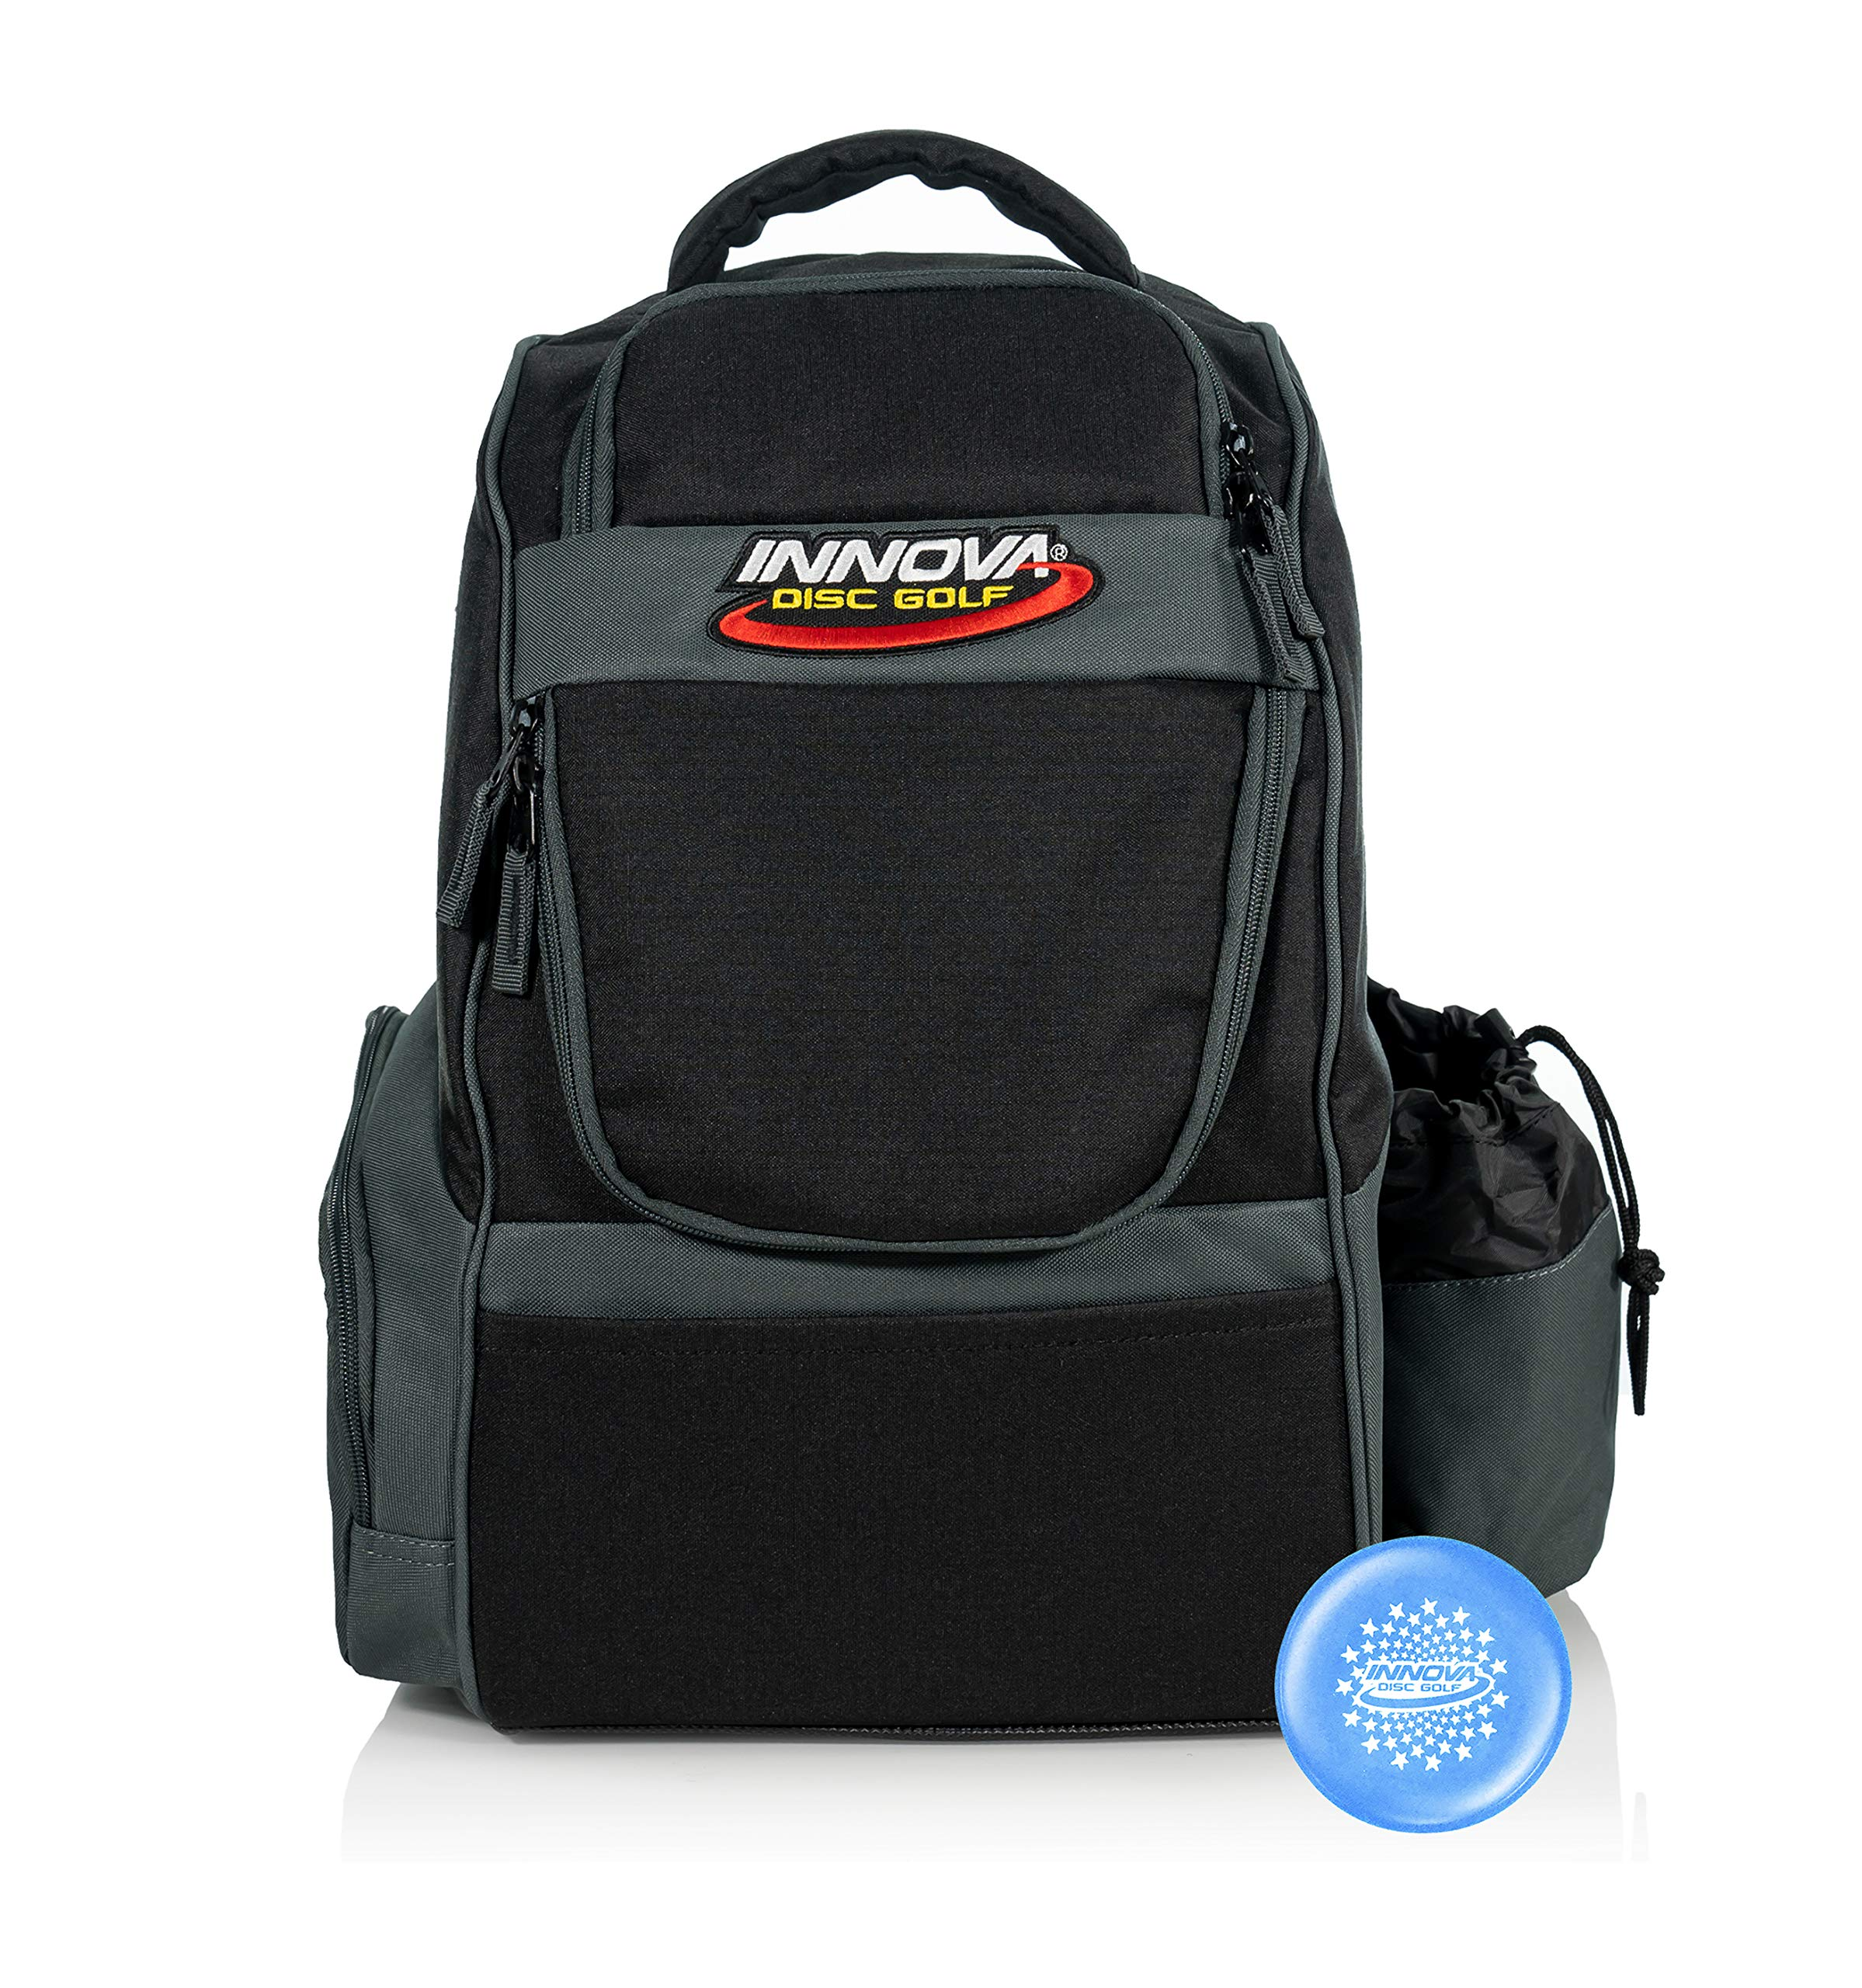 Innova Adventure Pack Backpack Disc